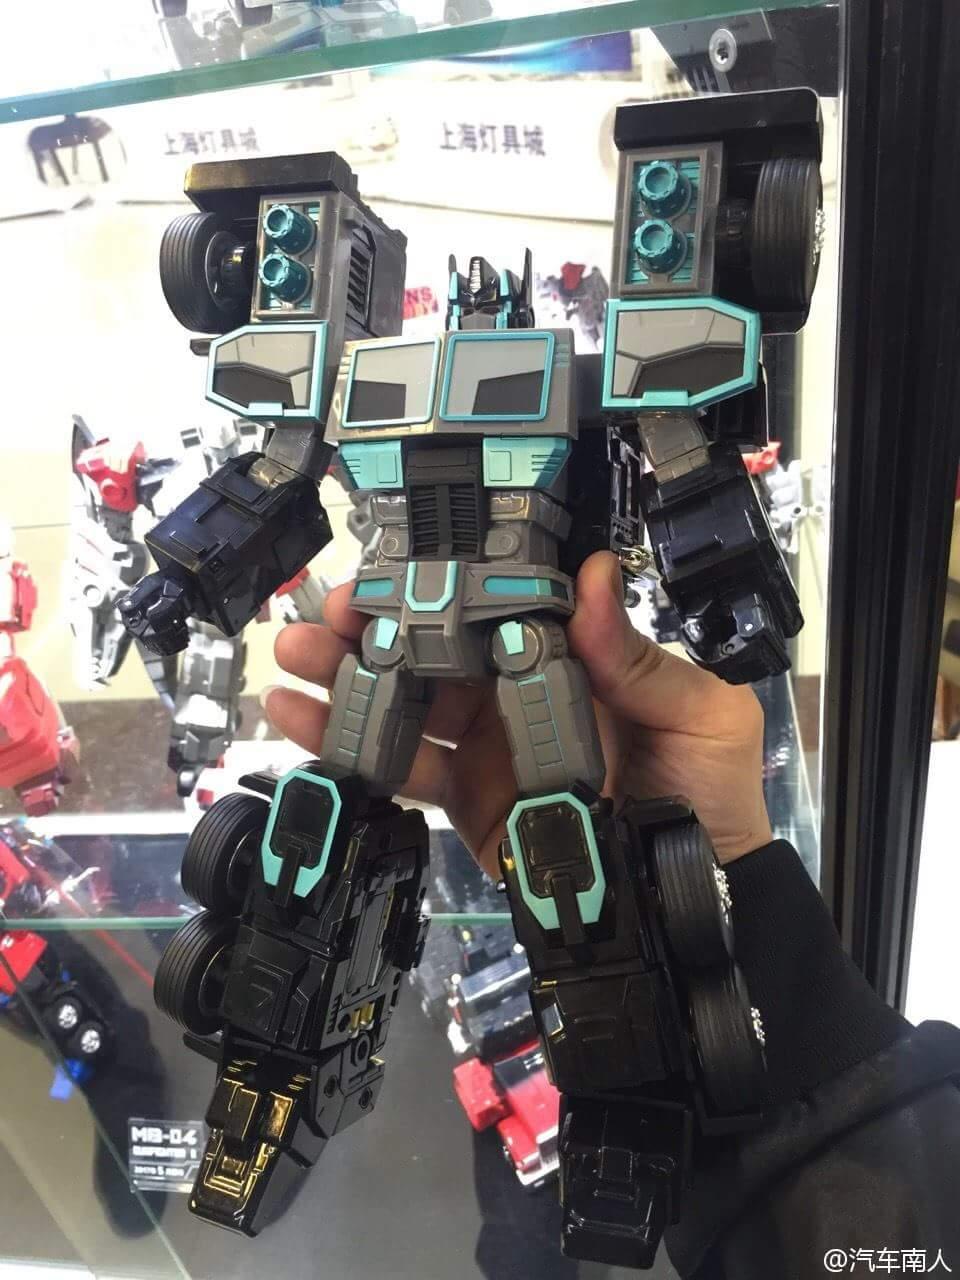 [FansHobby] Produit Tiers - Master Builder MB-01 Archenemy (aka Scourge RID 2000),  MB-04 Gunfighter II (aka Laser Optimus G2) et MB-09 Trailer (remorque) AOZGO8JD